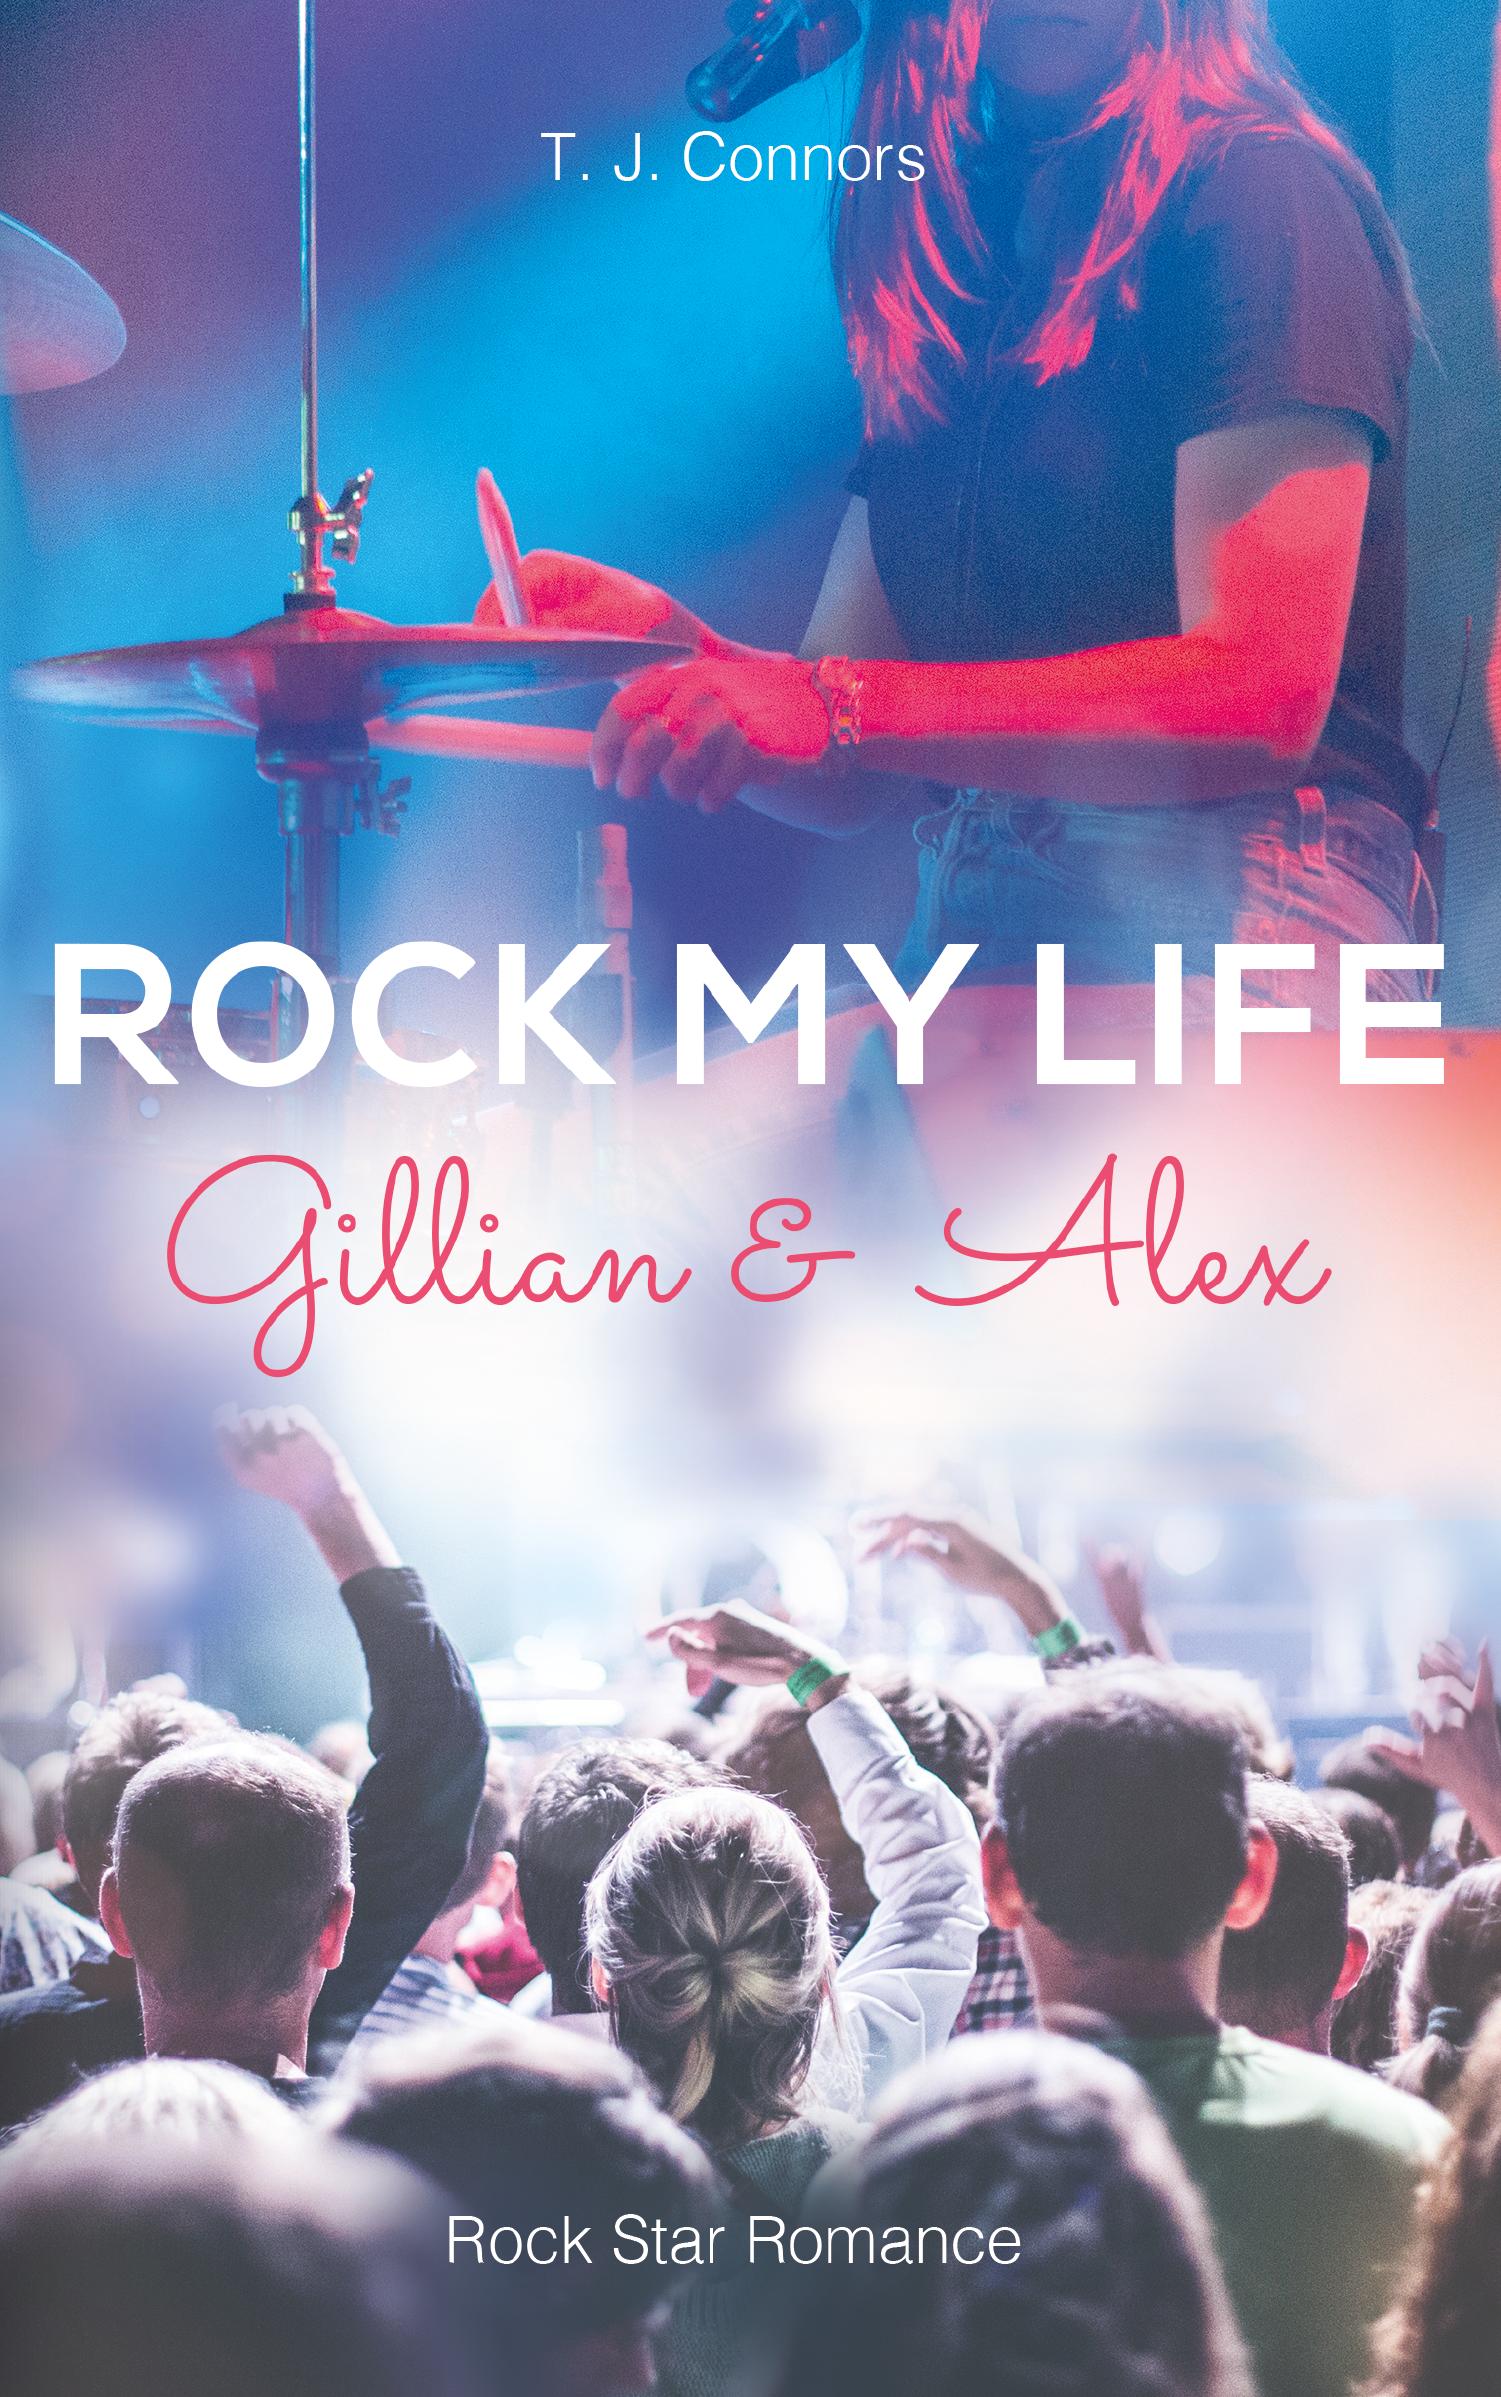 T. J. Connors – Rock My Life – Gillian & Alex